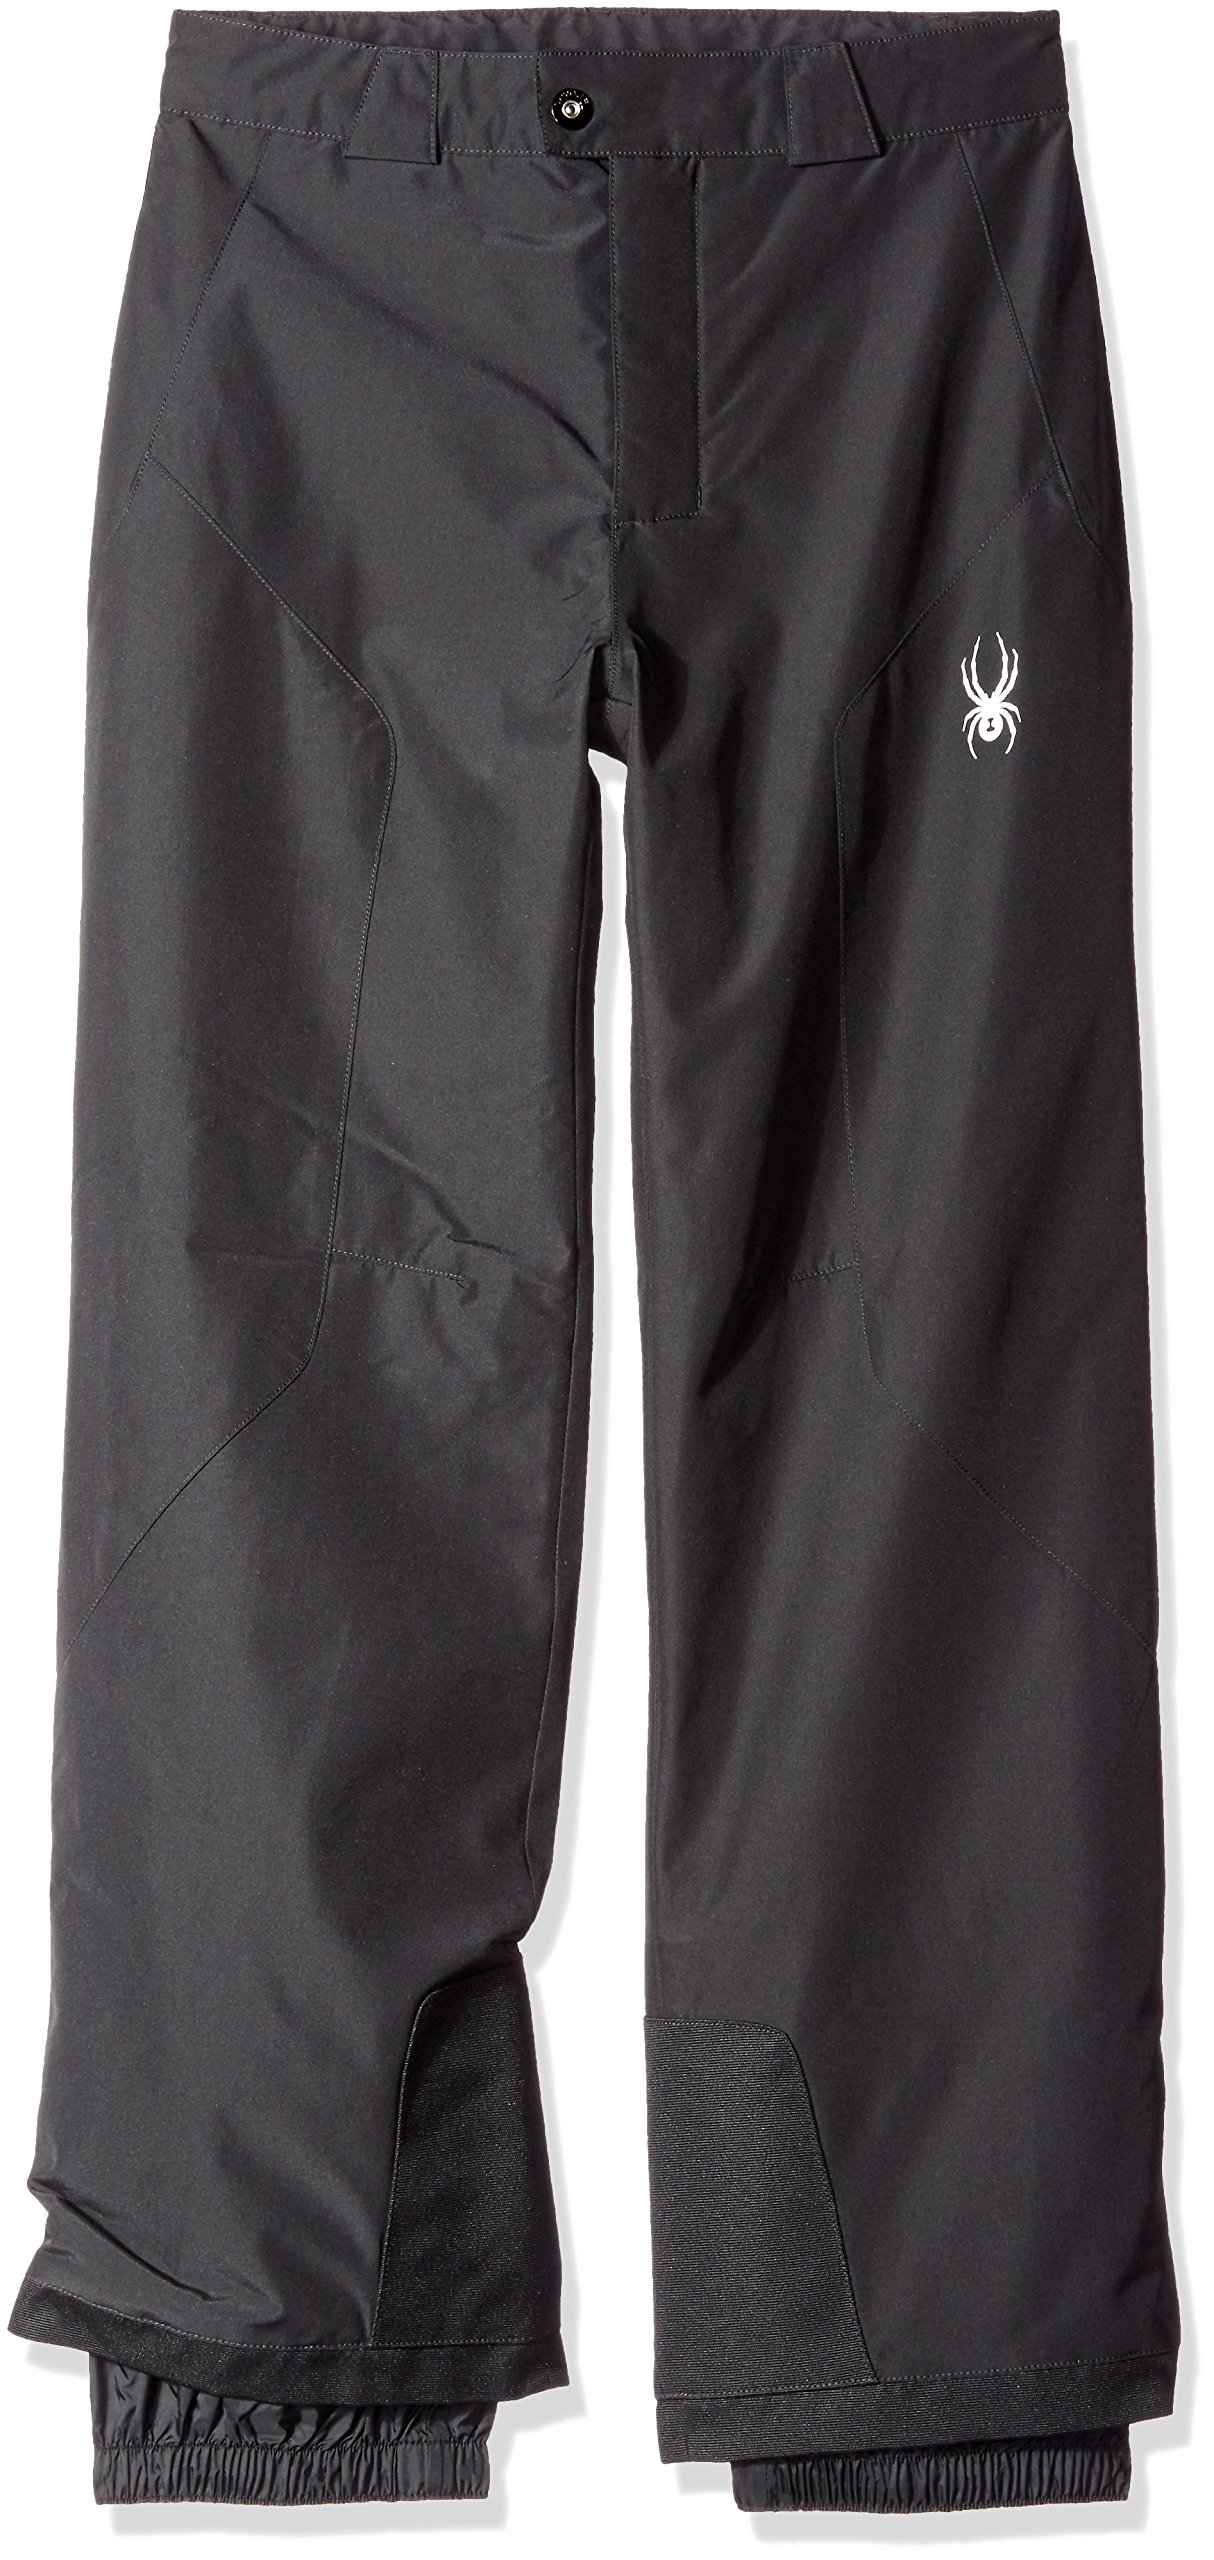 Spyder Boys Siege Pants, Medium, Black